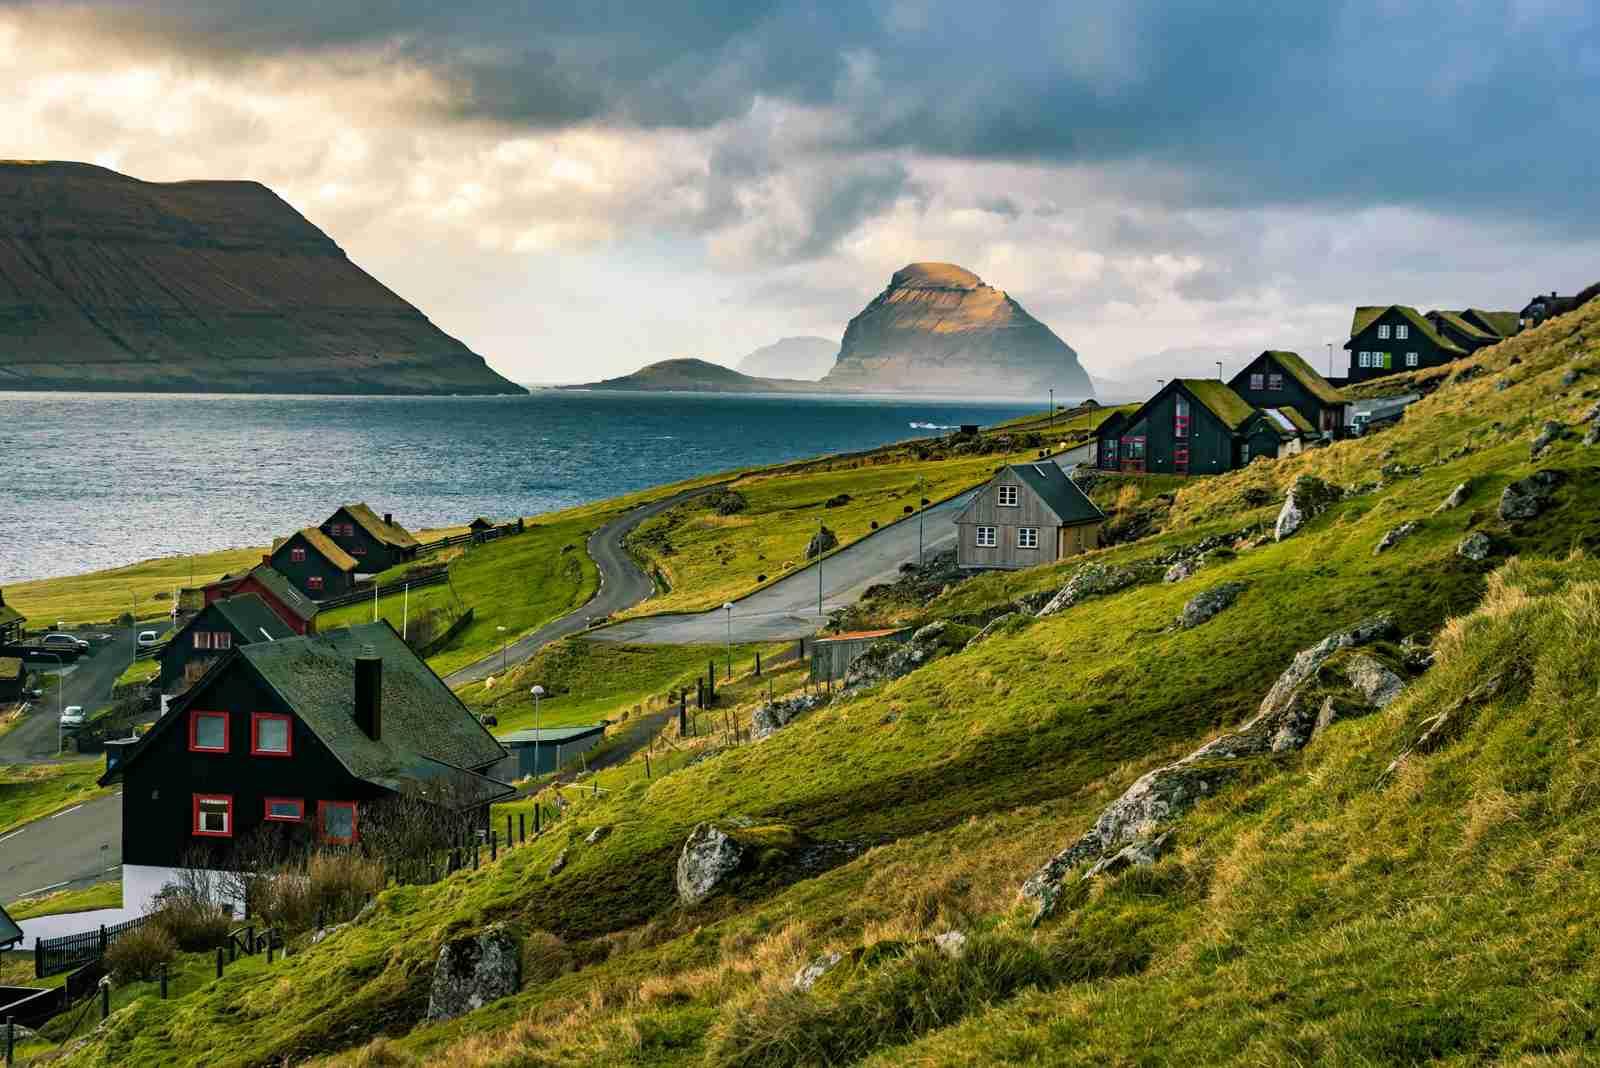 Kirkjubøur and Koltur in the Faroe Islands. (Photo by Posnov/Getty Images)